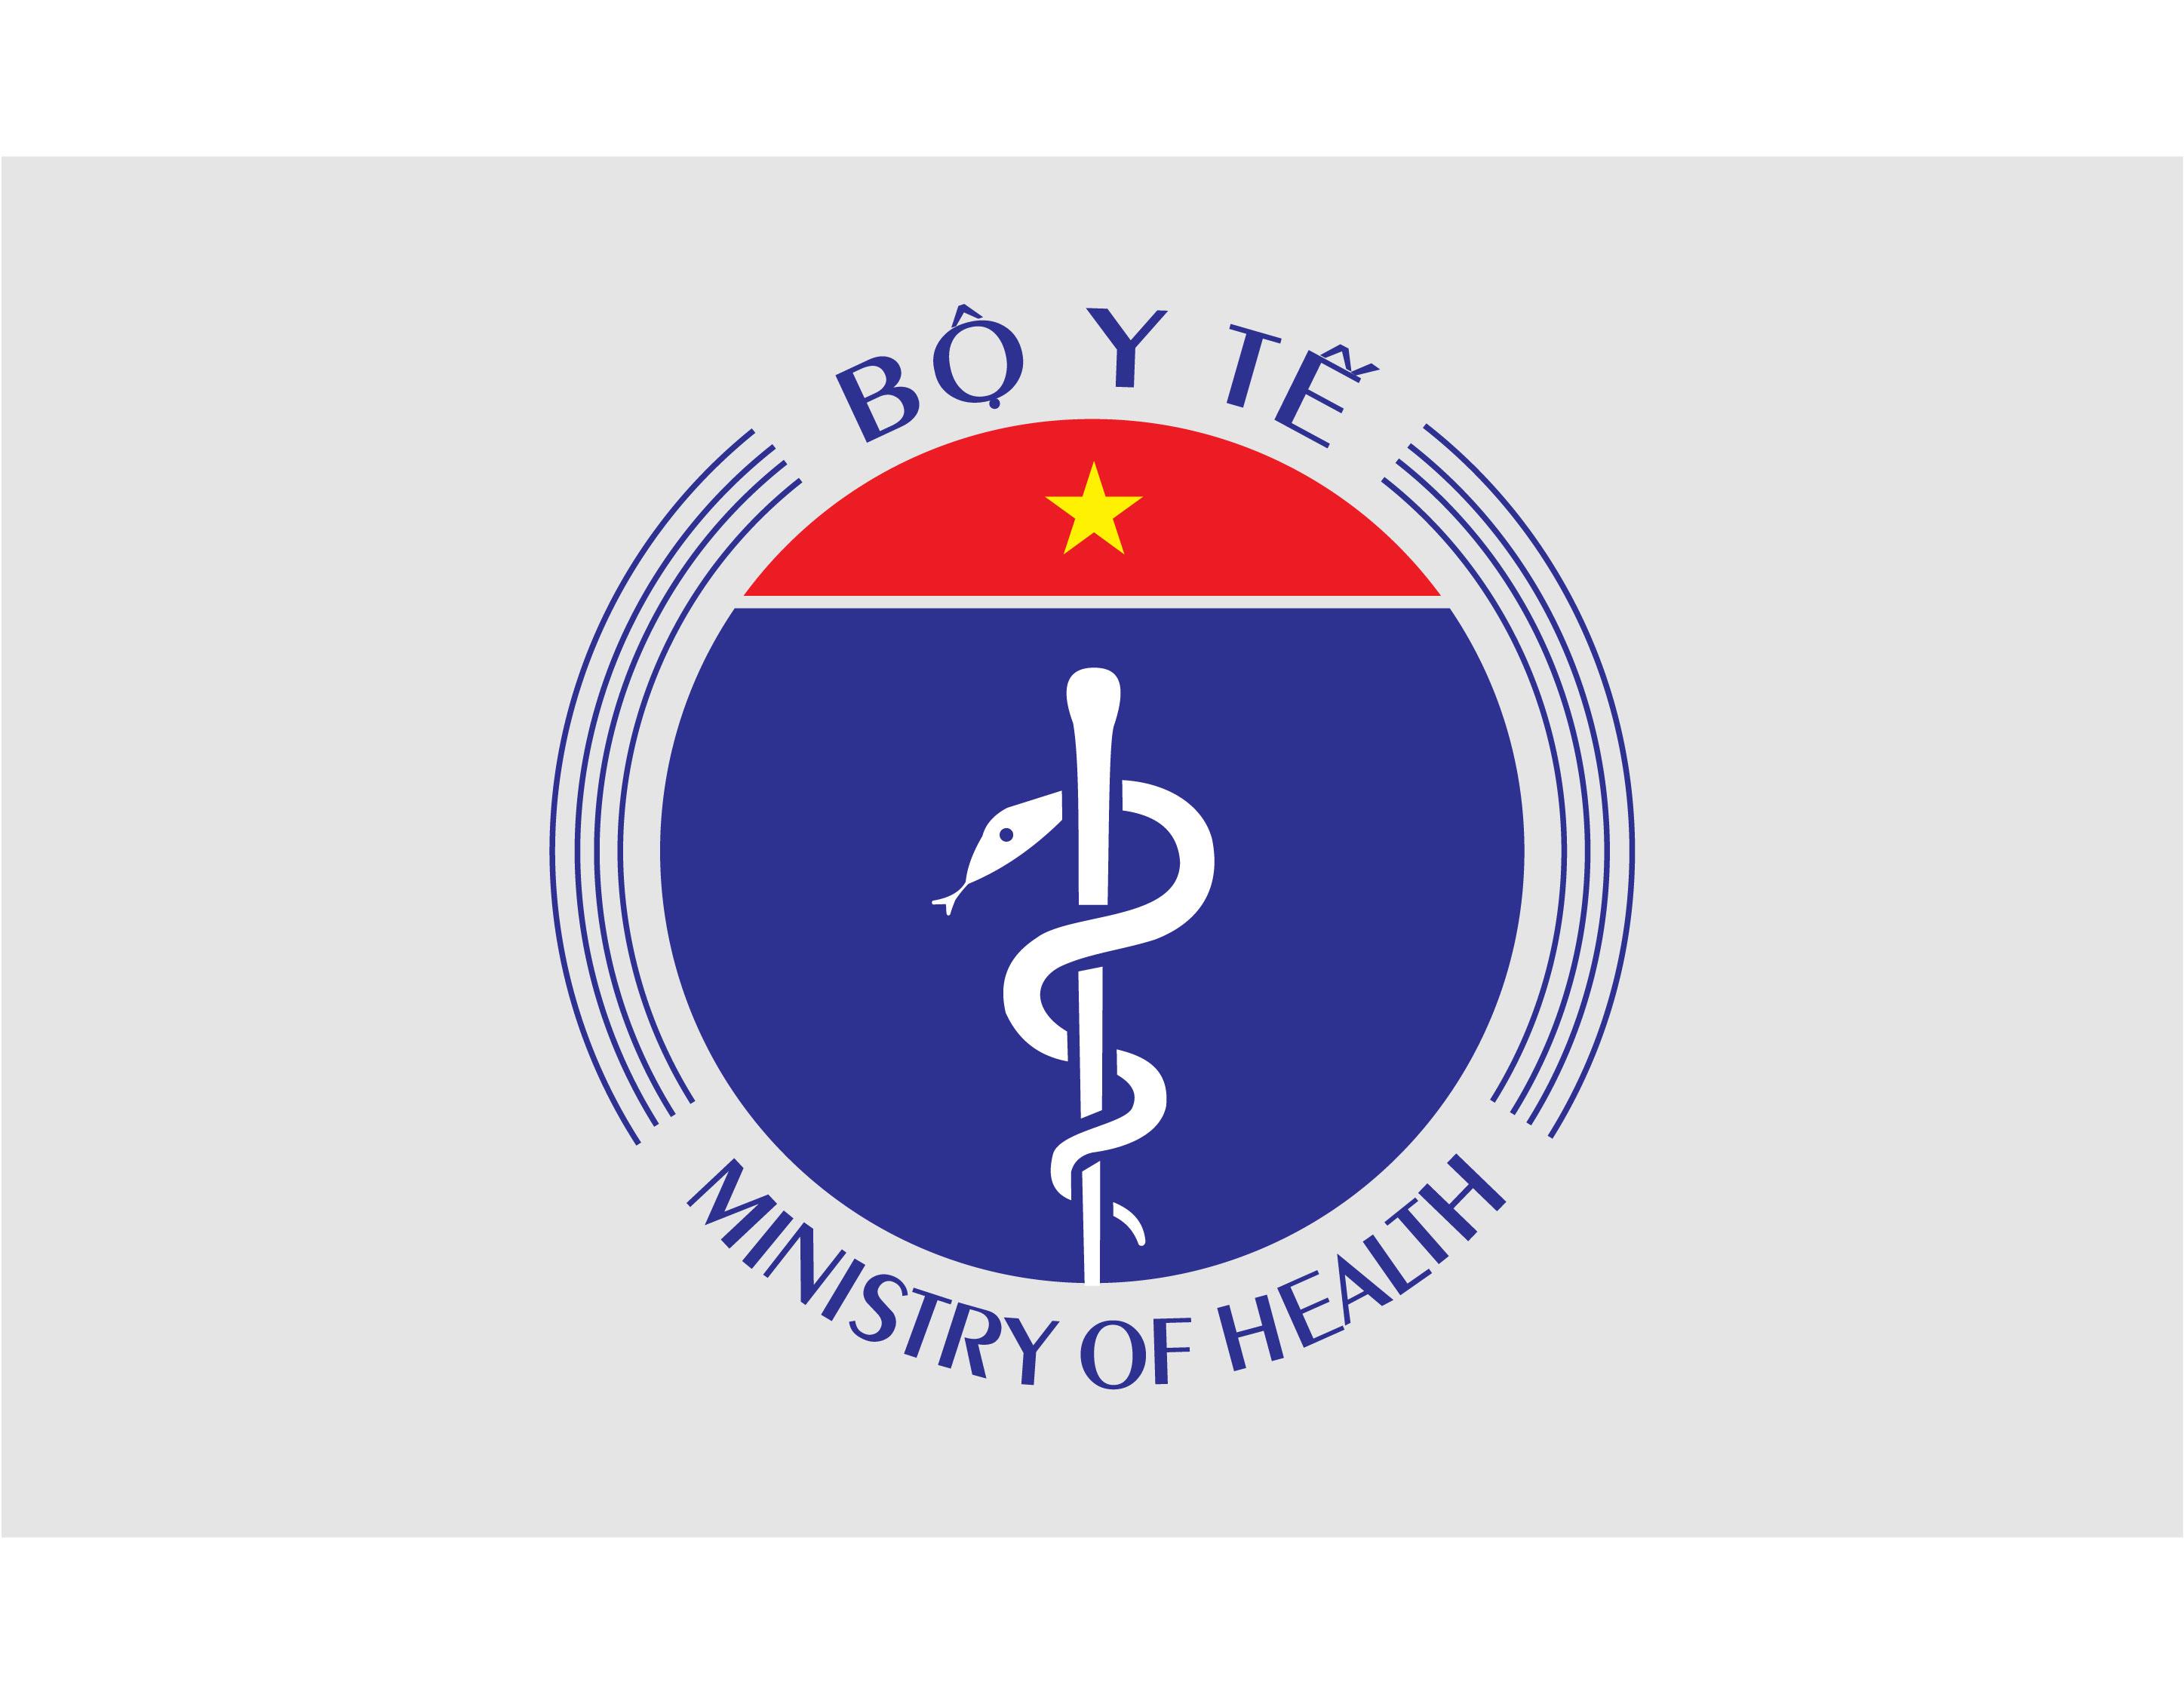 Logo Bộ Y tế vector – File Ai, png, pdf